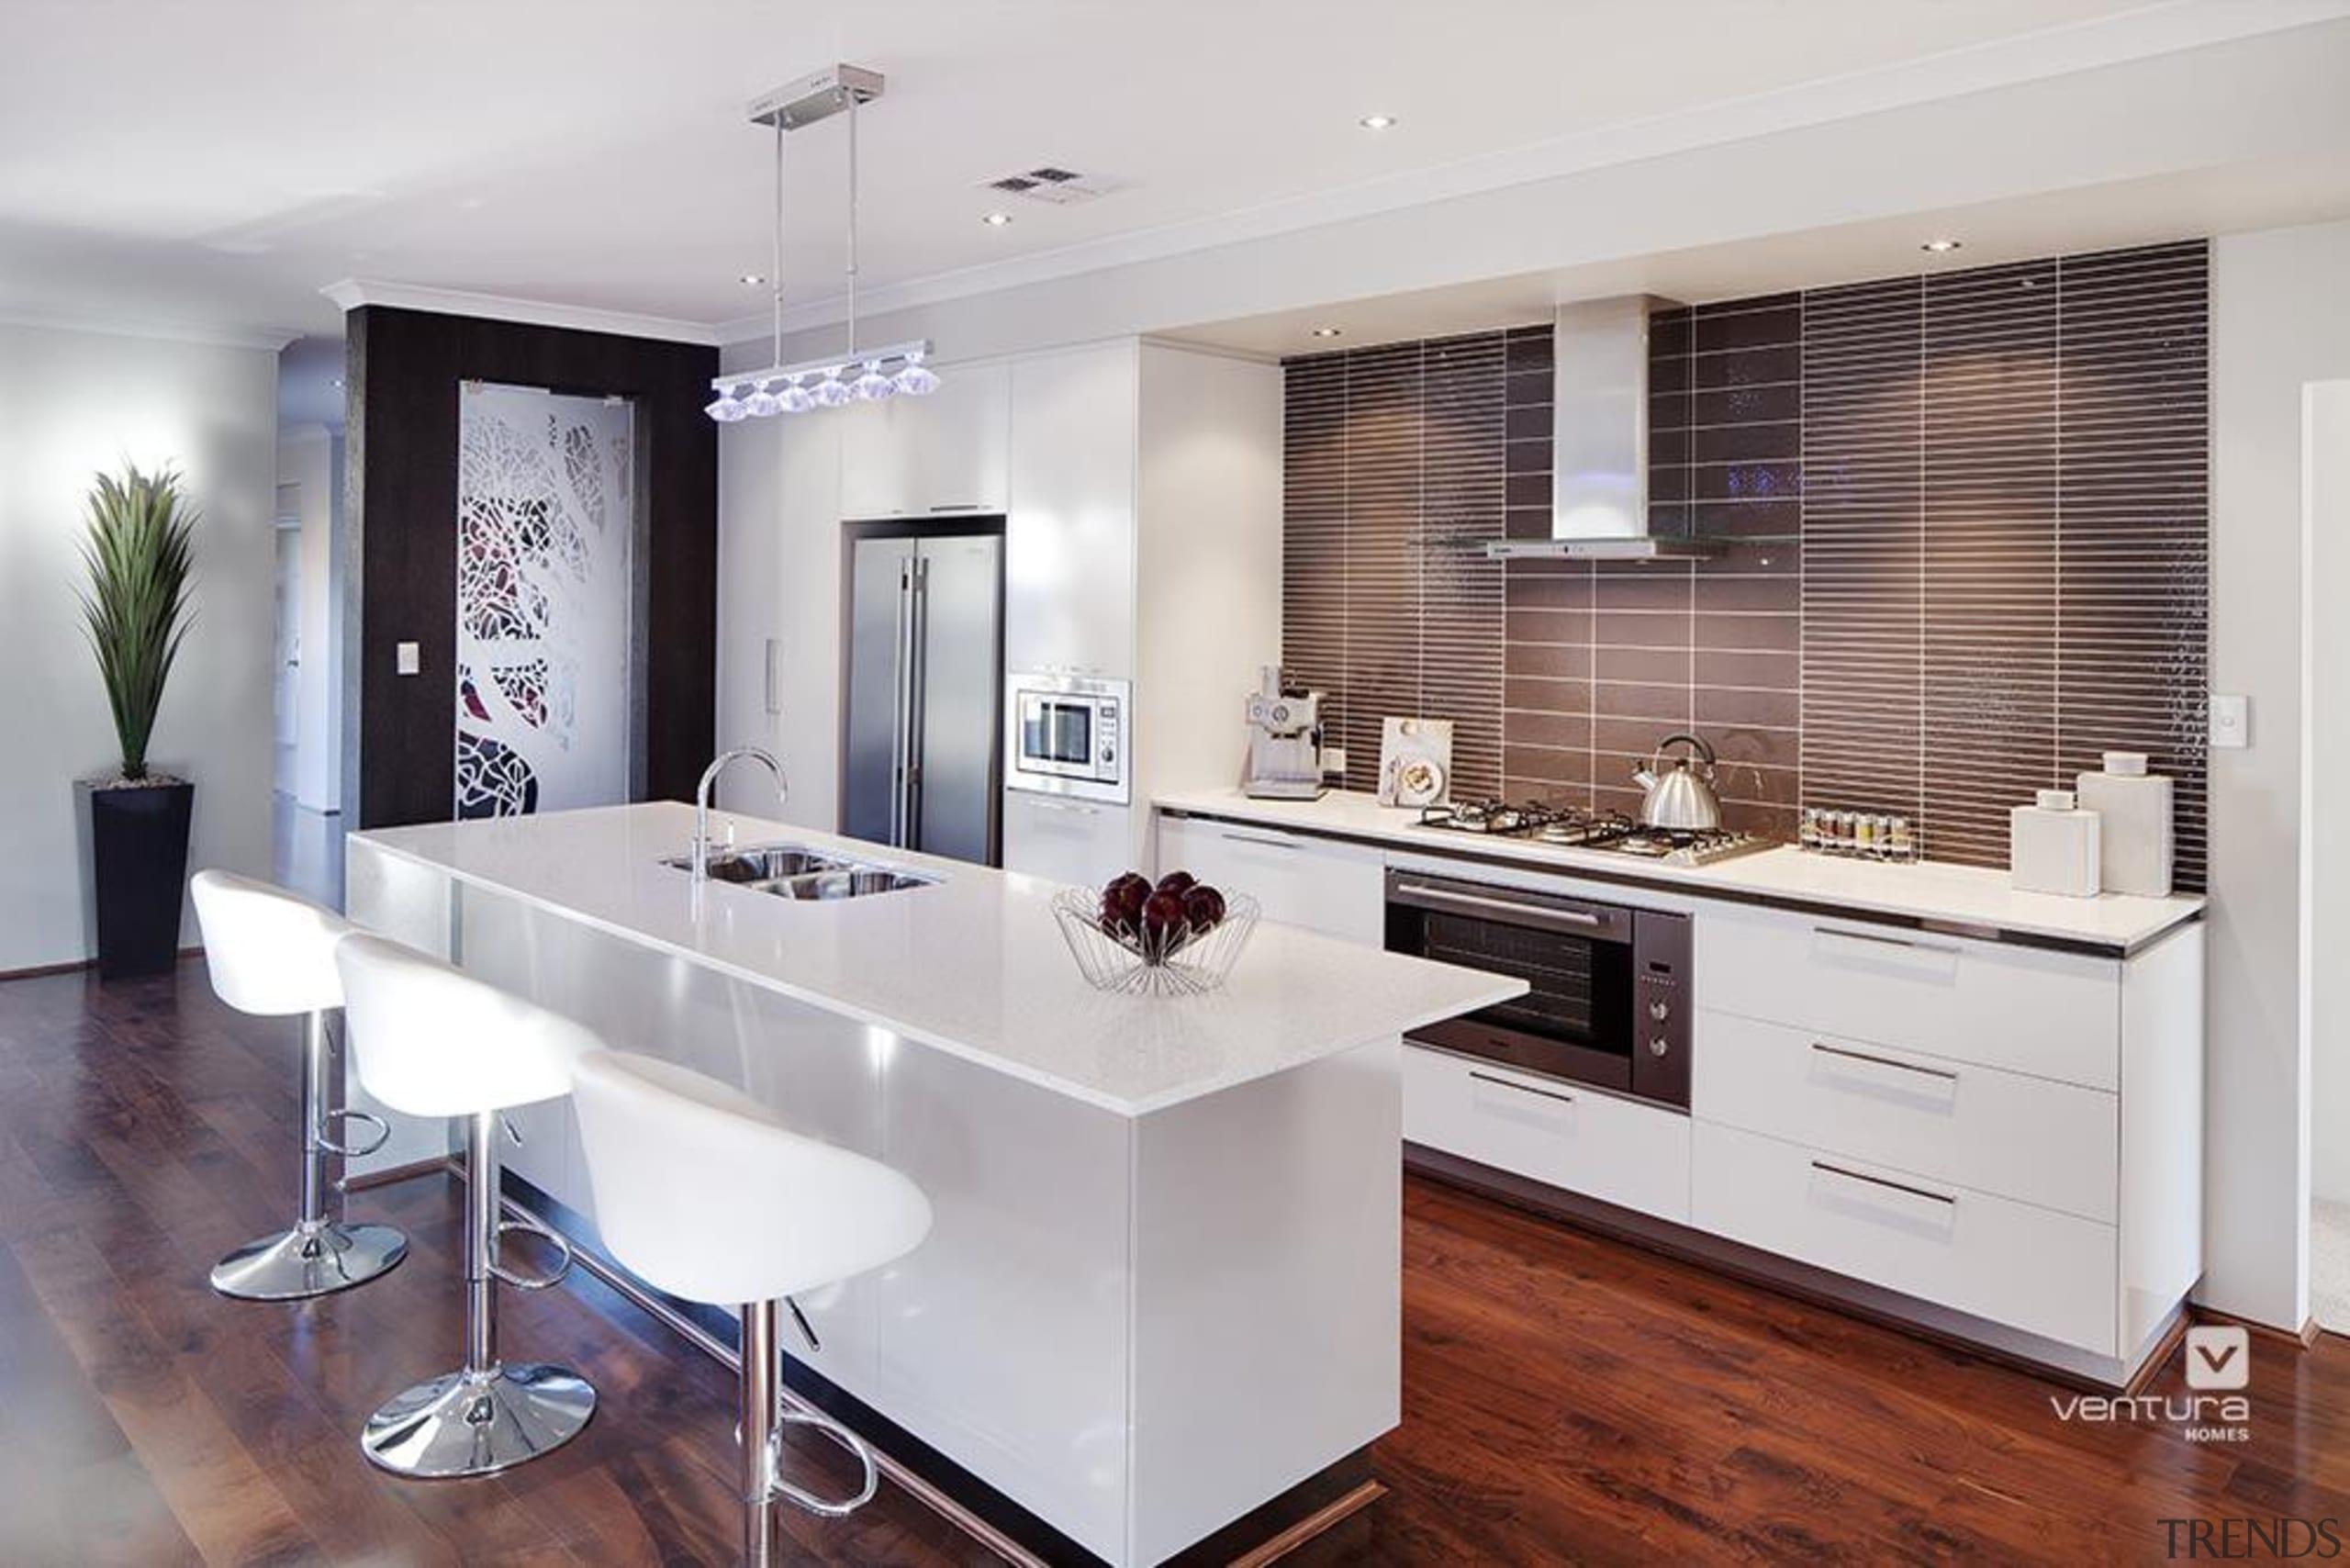 Kitchen design. - The Nirvana Display Home - cabinetry, countertop, cuisine classique, floor, flooring, interior design, kitchen, real estate, room, gray